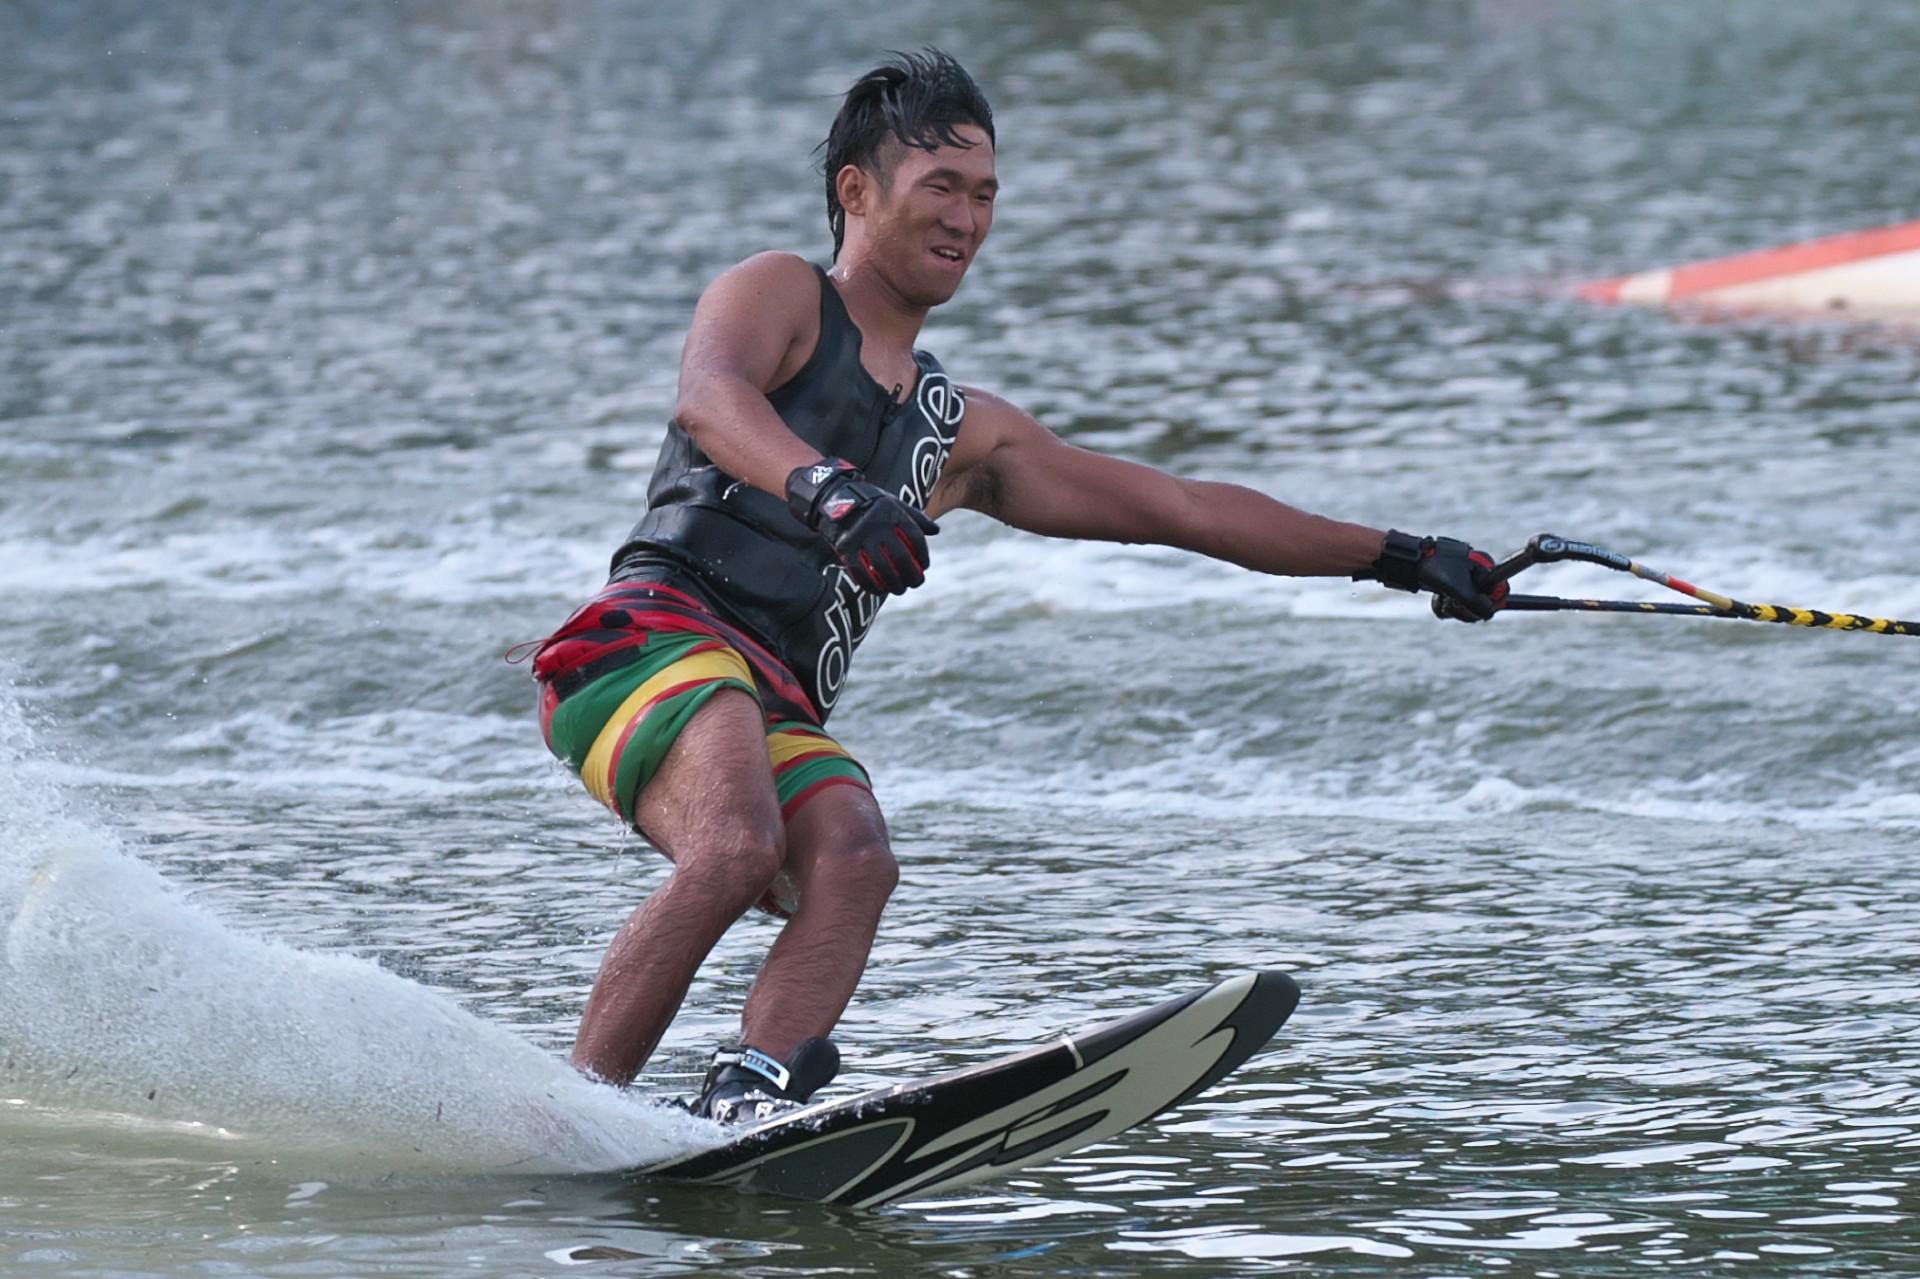 2016JcWC_Slalomtrial#1 稲寺驎太郎